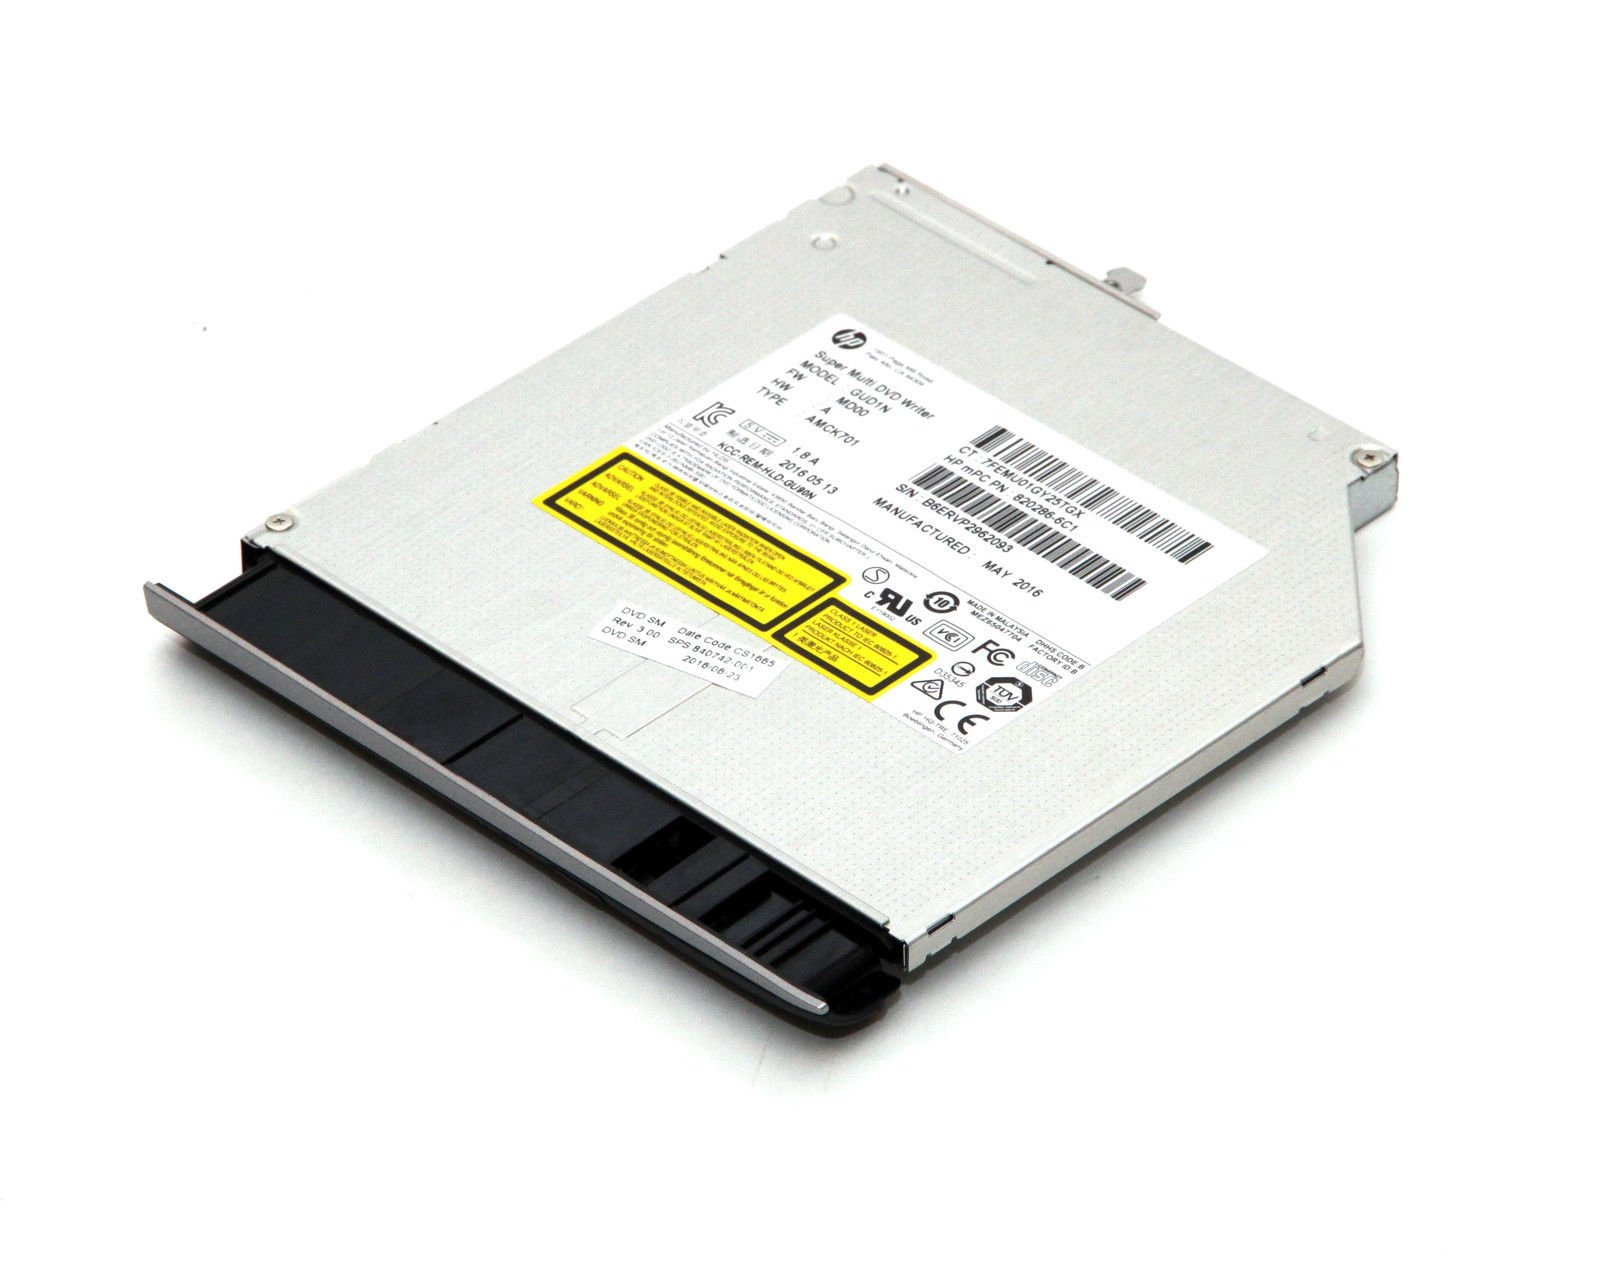 New Genuine HP ProBook 650 G2 SeriesDVDRW Drive Optical Drive 840742-001